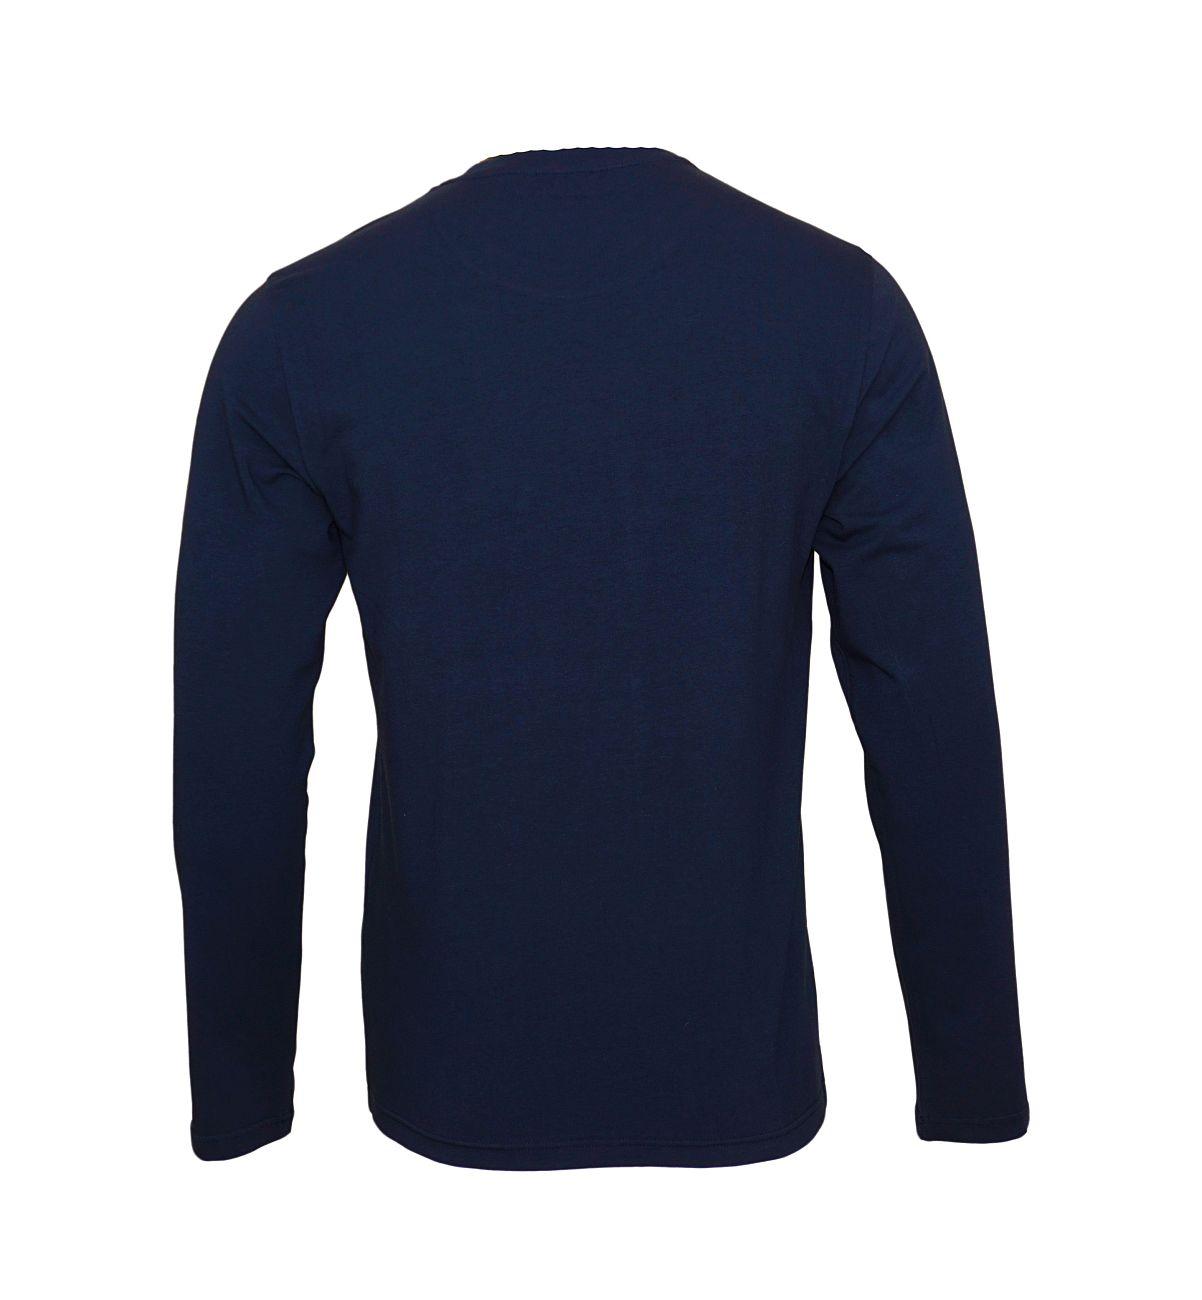 Emporio Armani Longsleeve Rundhals Shirt 111653 8A720 00135 MARINE WX18-EAX